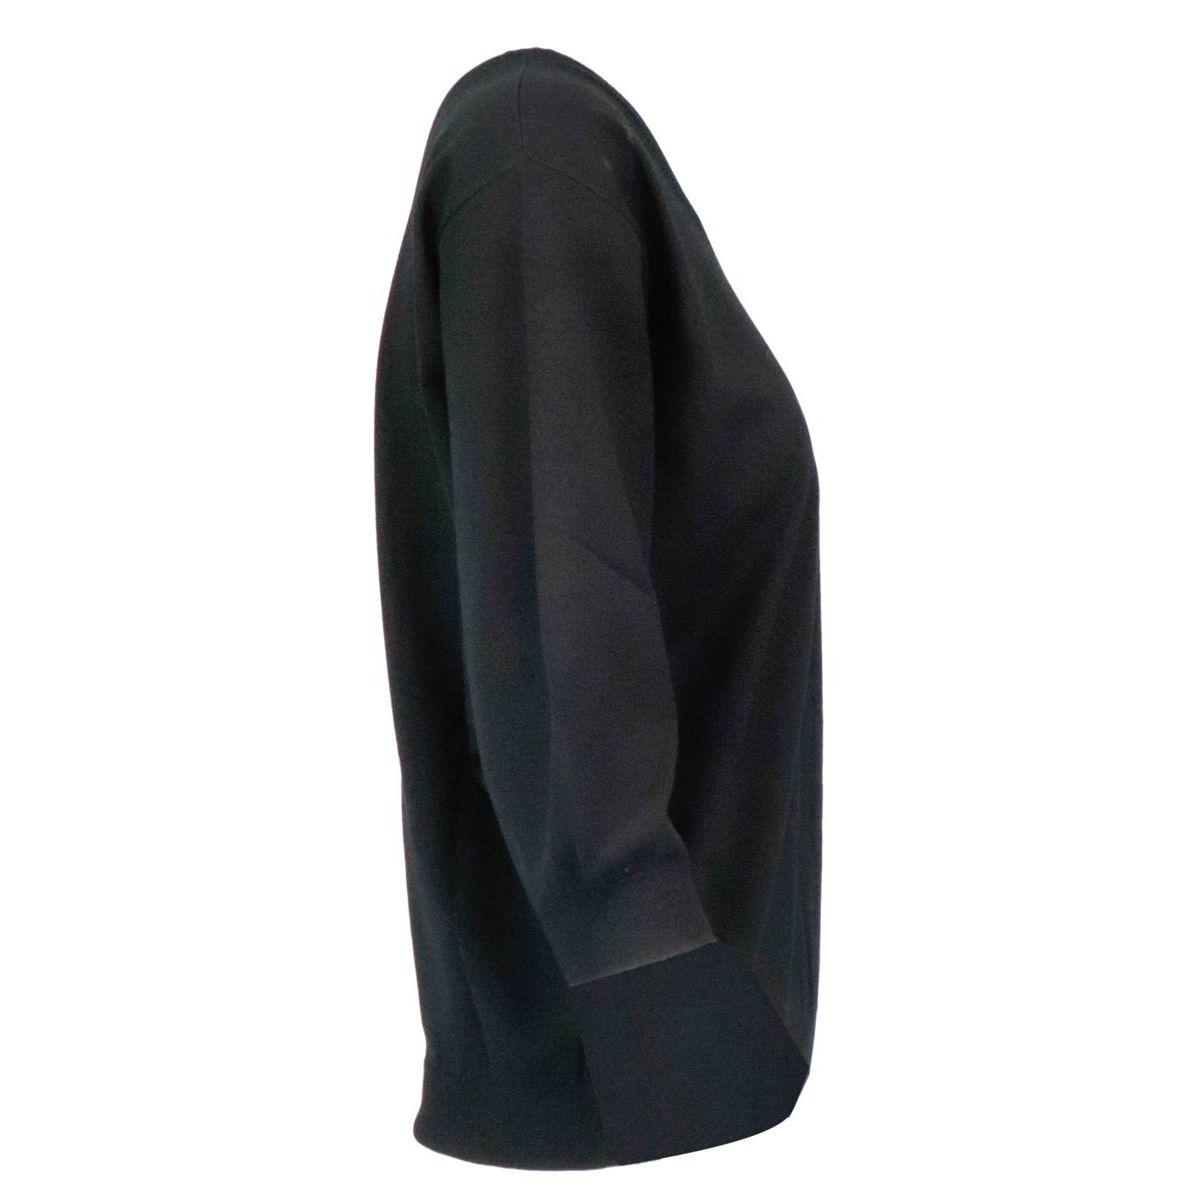 Spoleto viscose blend sweater Black S MAX MARA